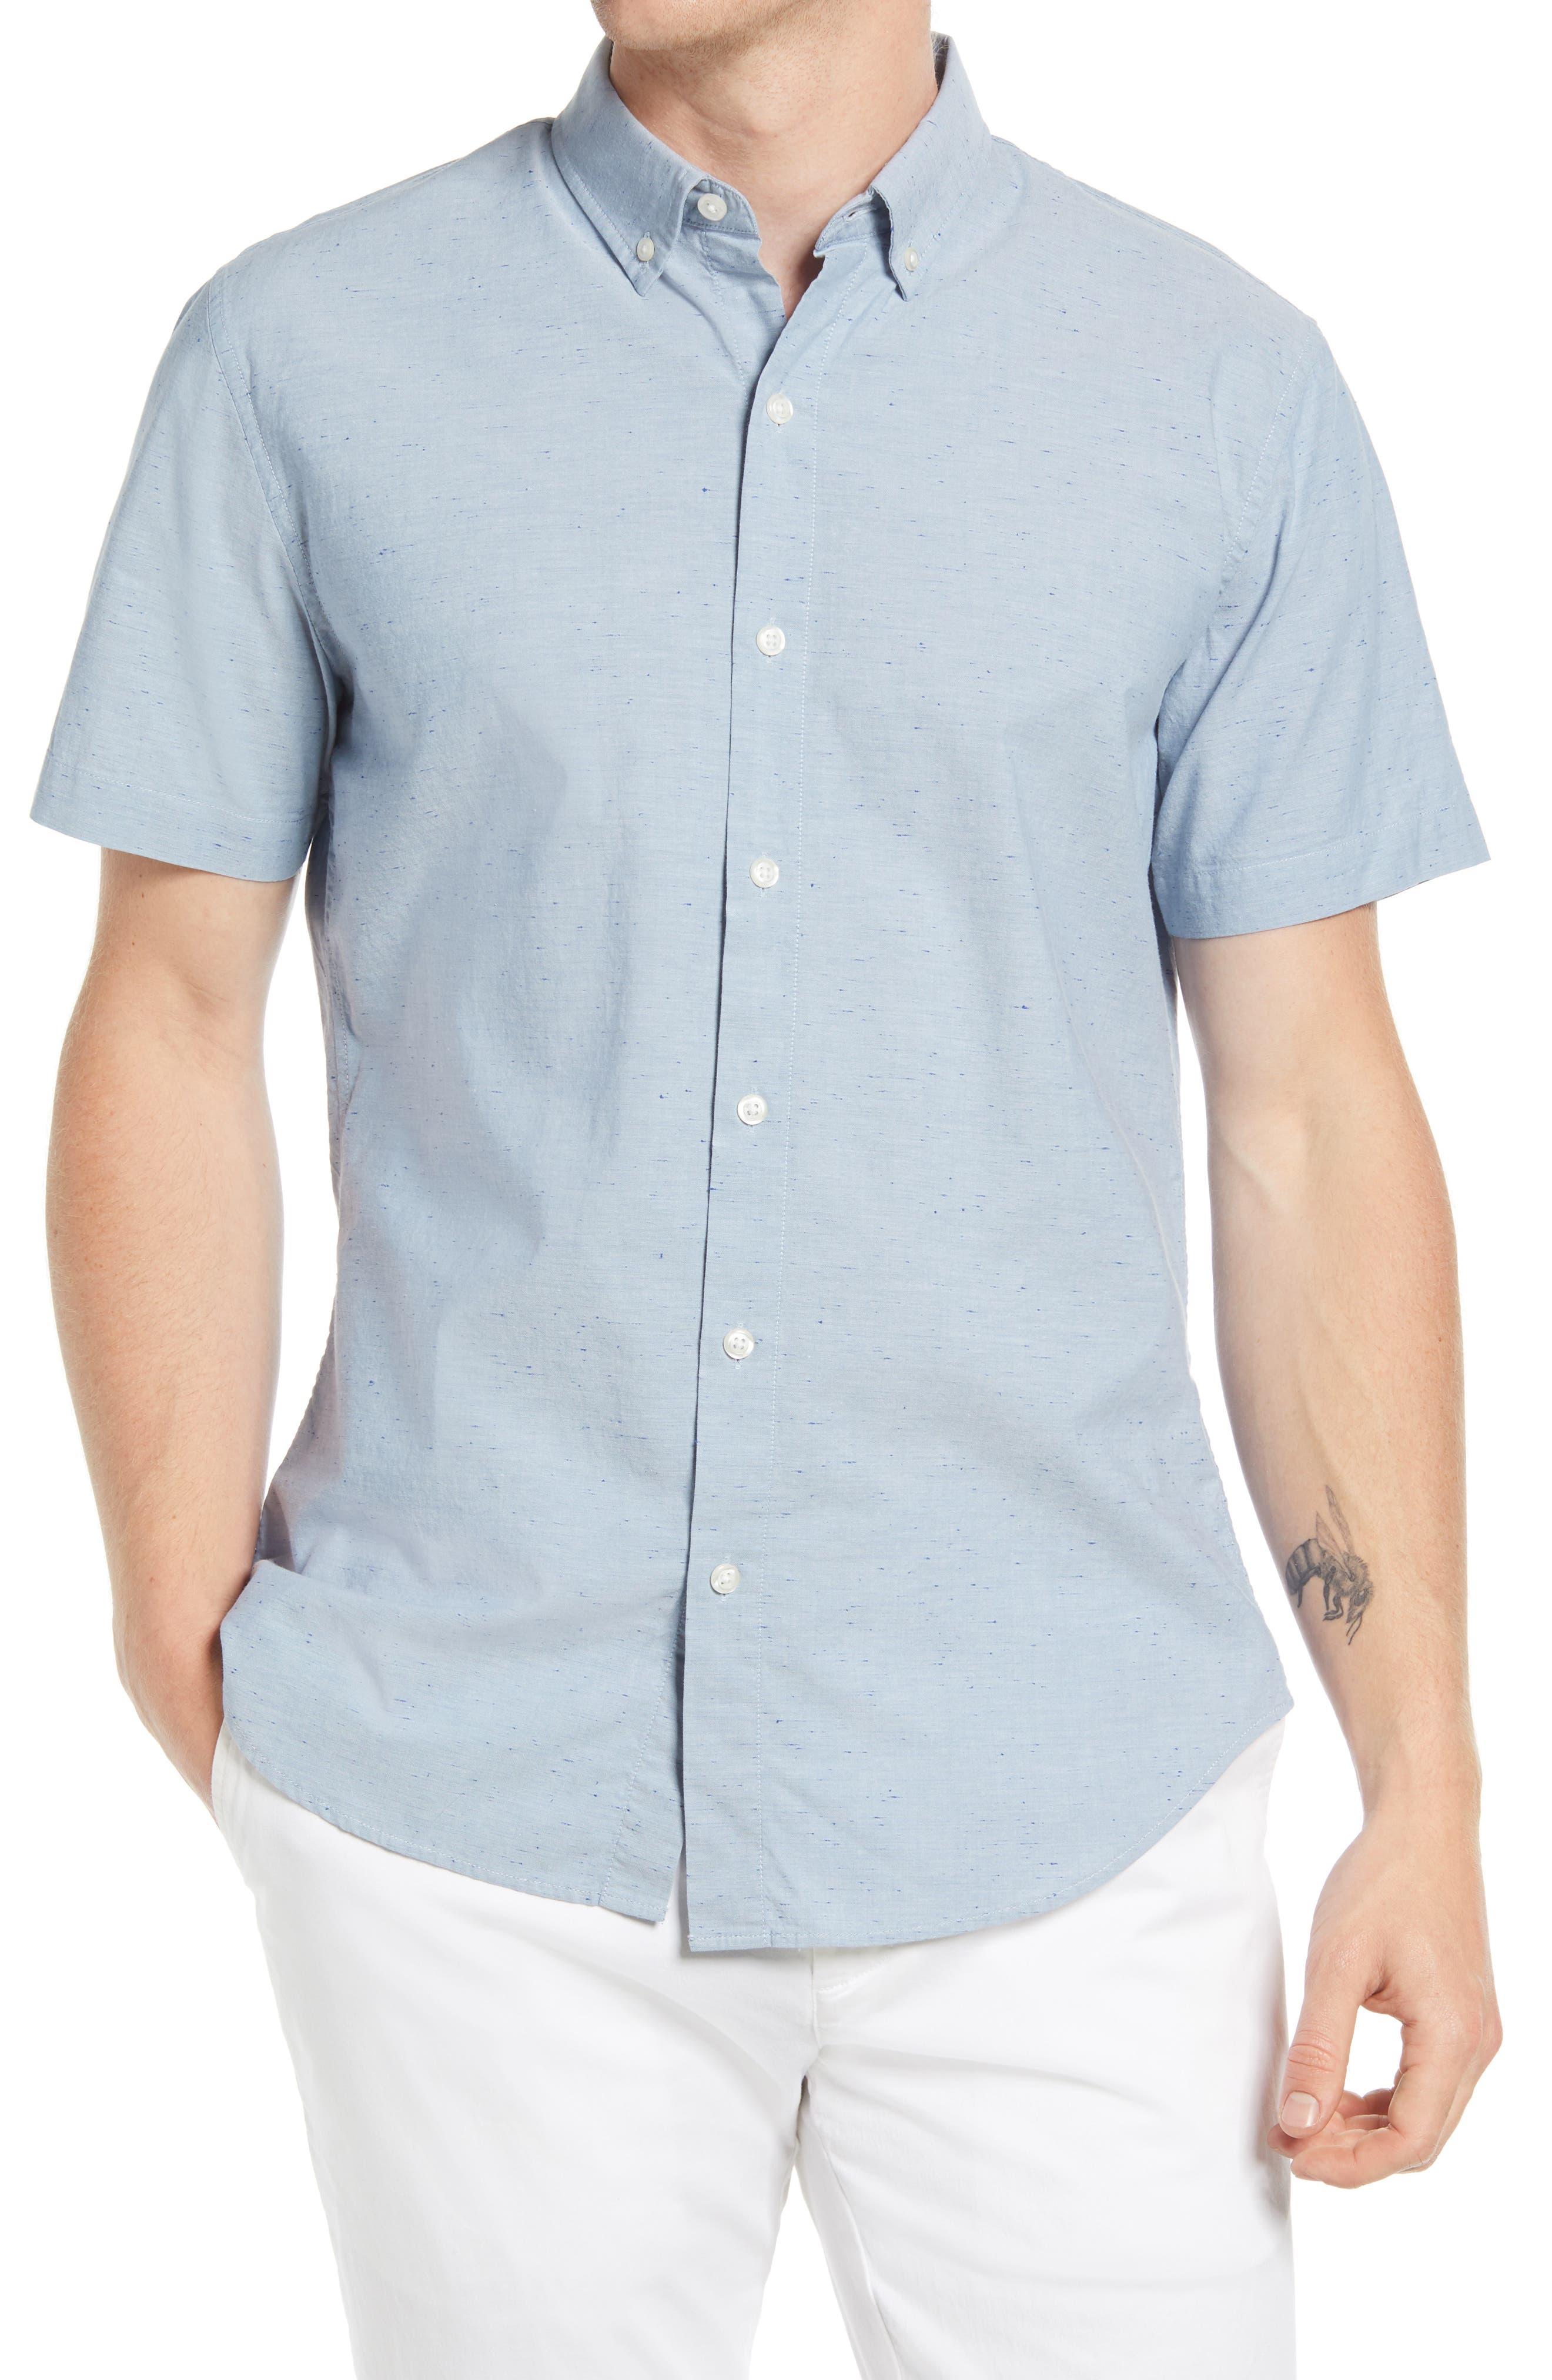 Riviera Slim Fit Short Sleeve Button-Down Shirt